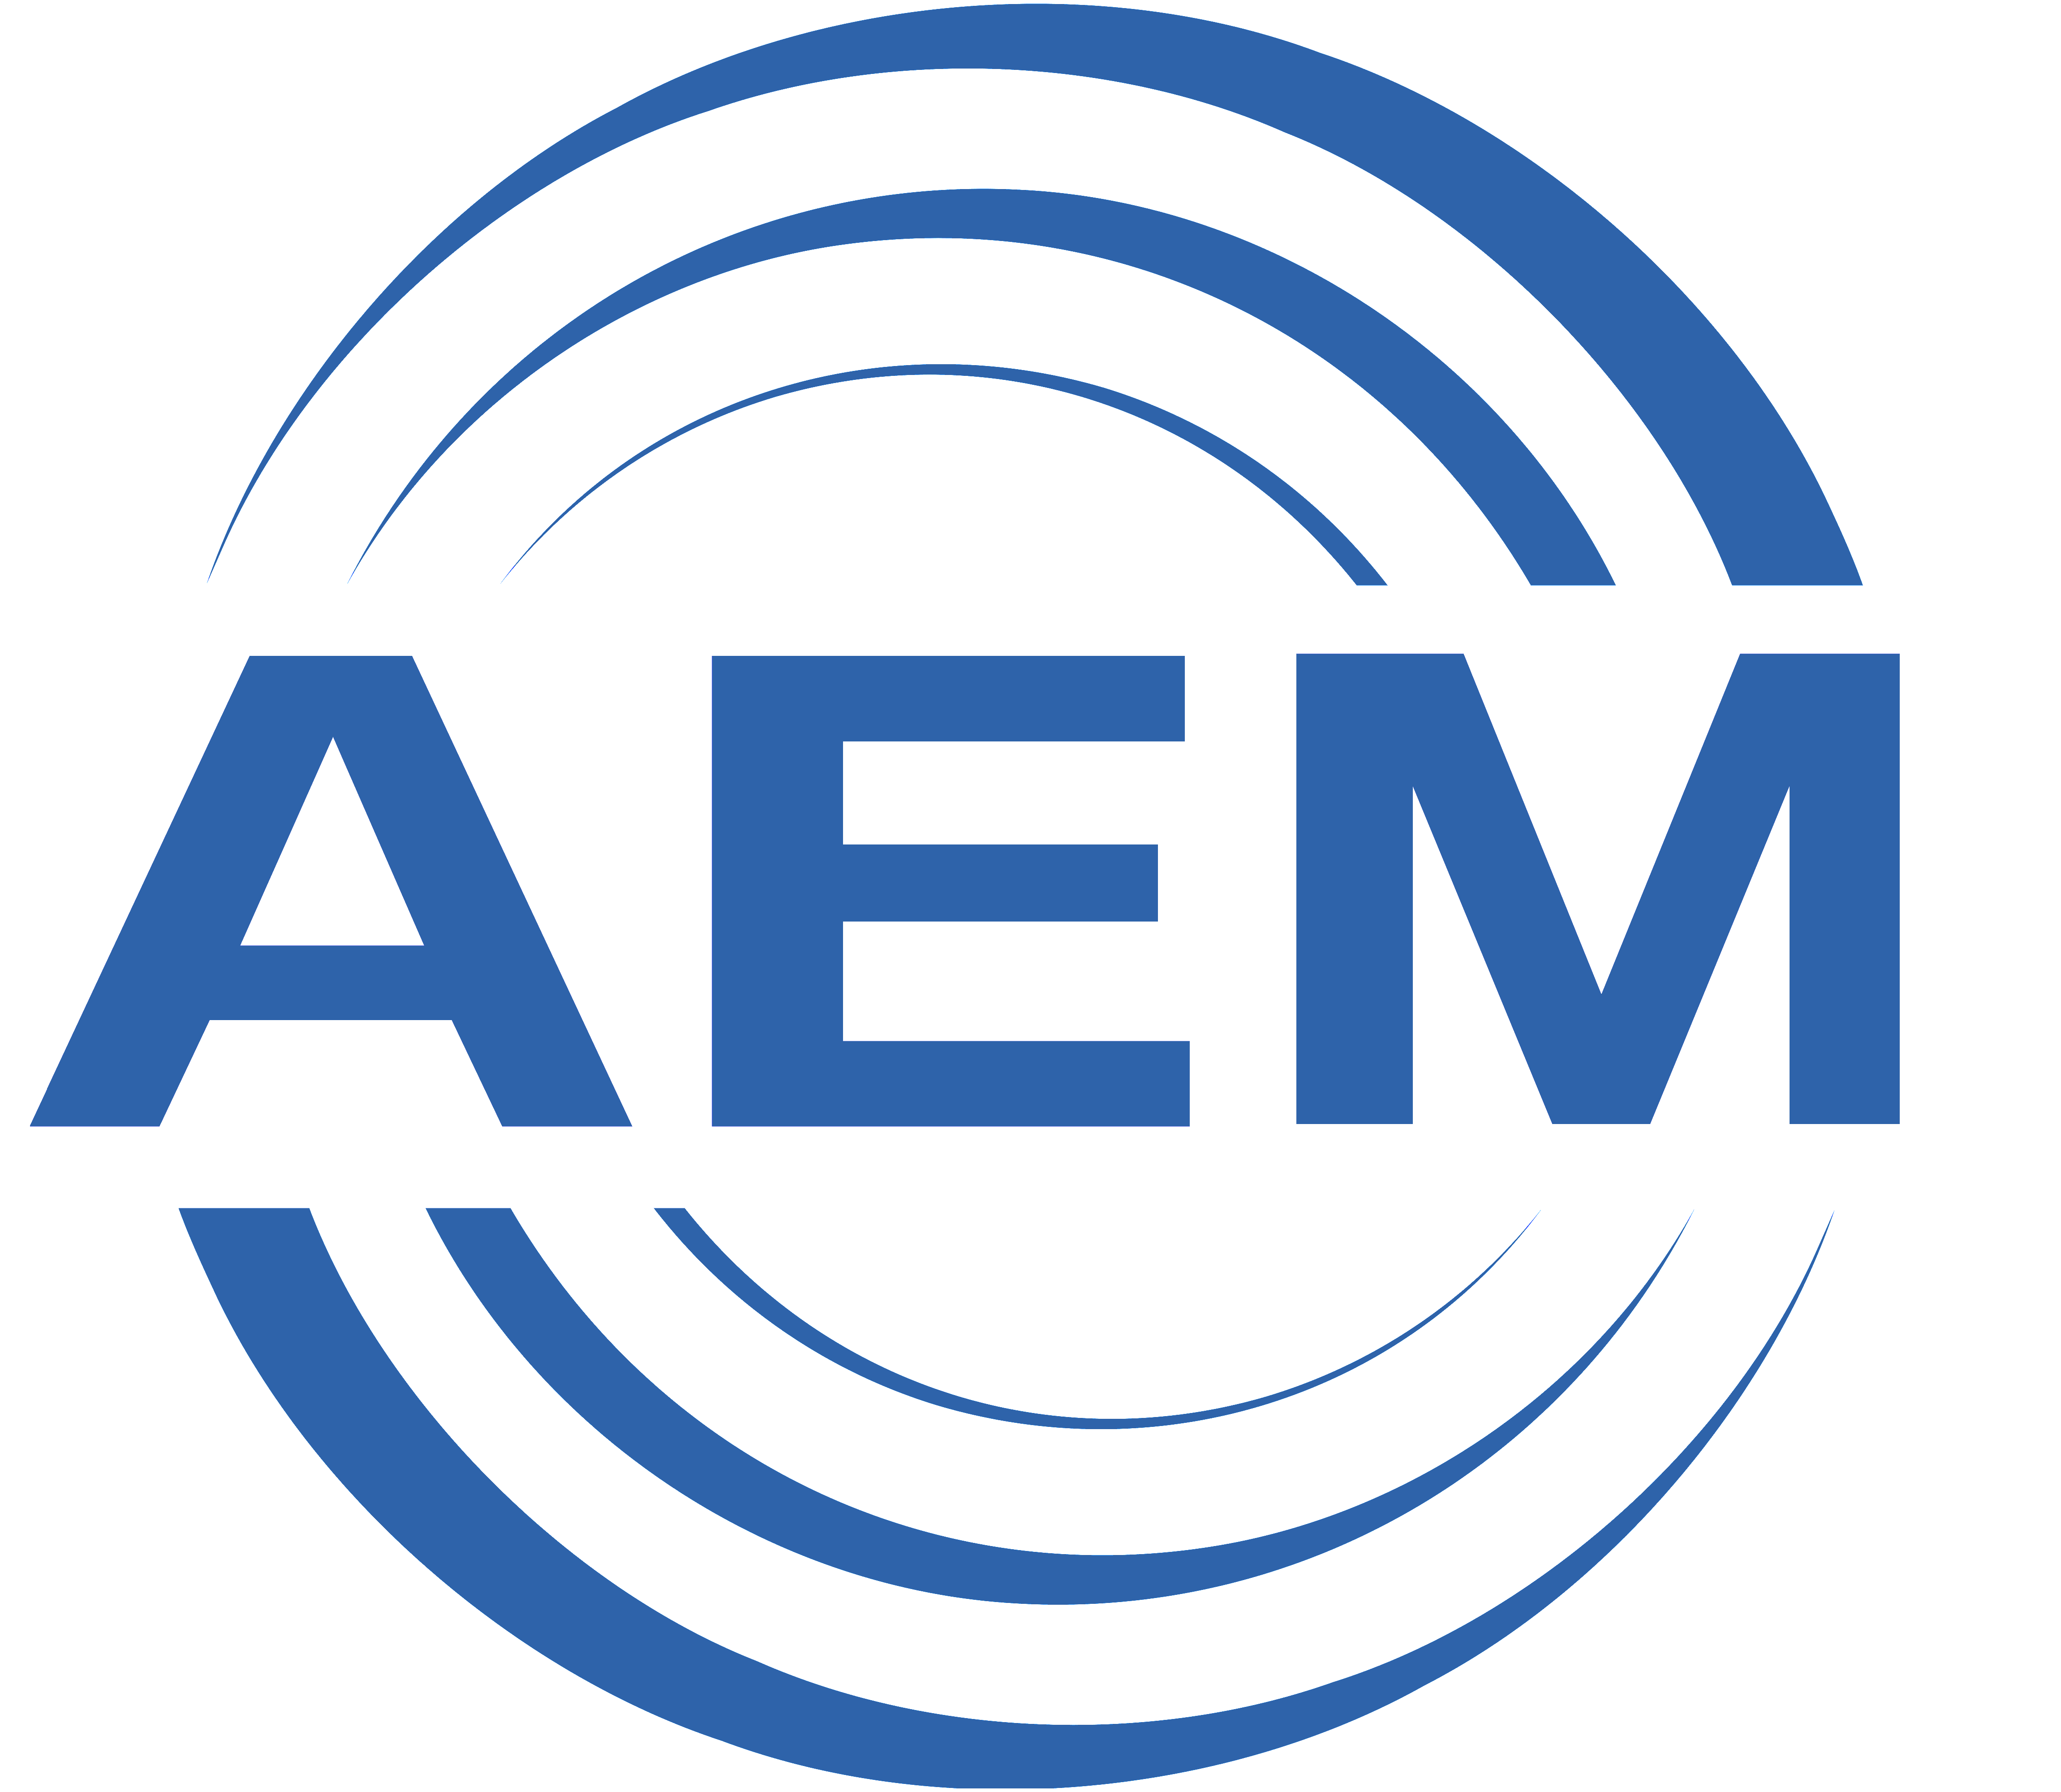 Aem Logo PNG - 114028